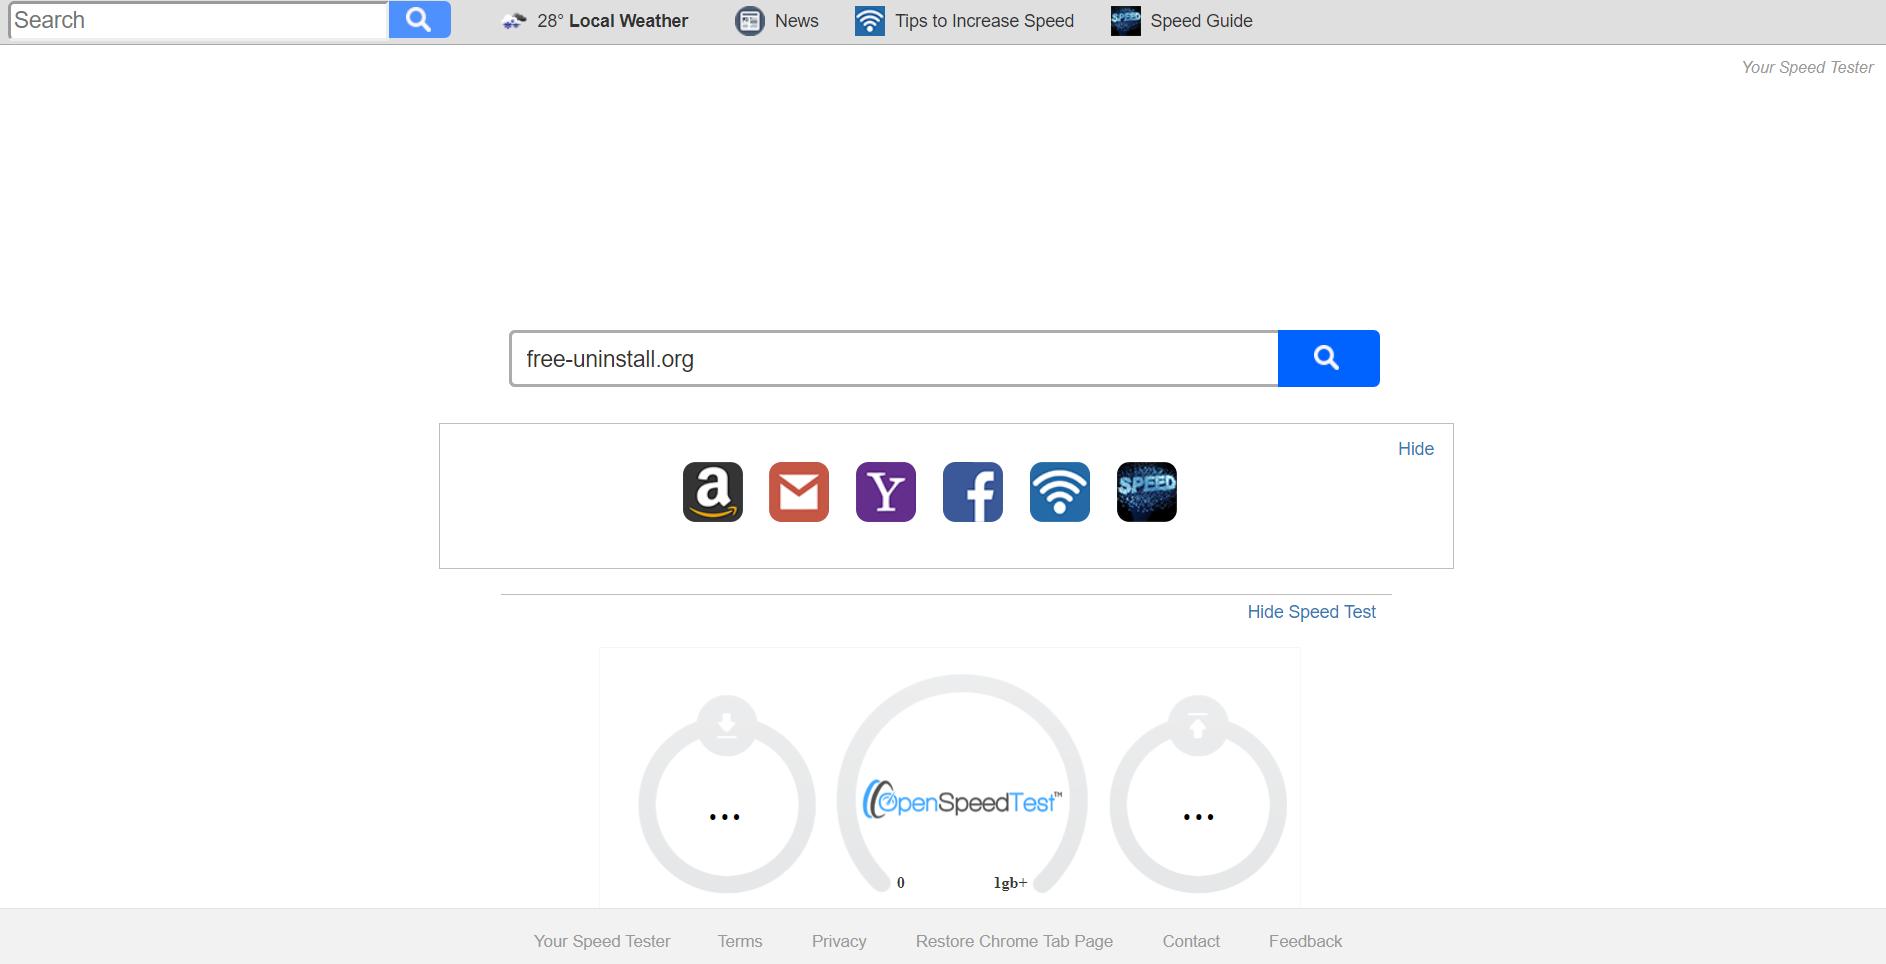 Search.yourspeedtester.com Hijacker